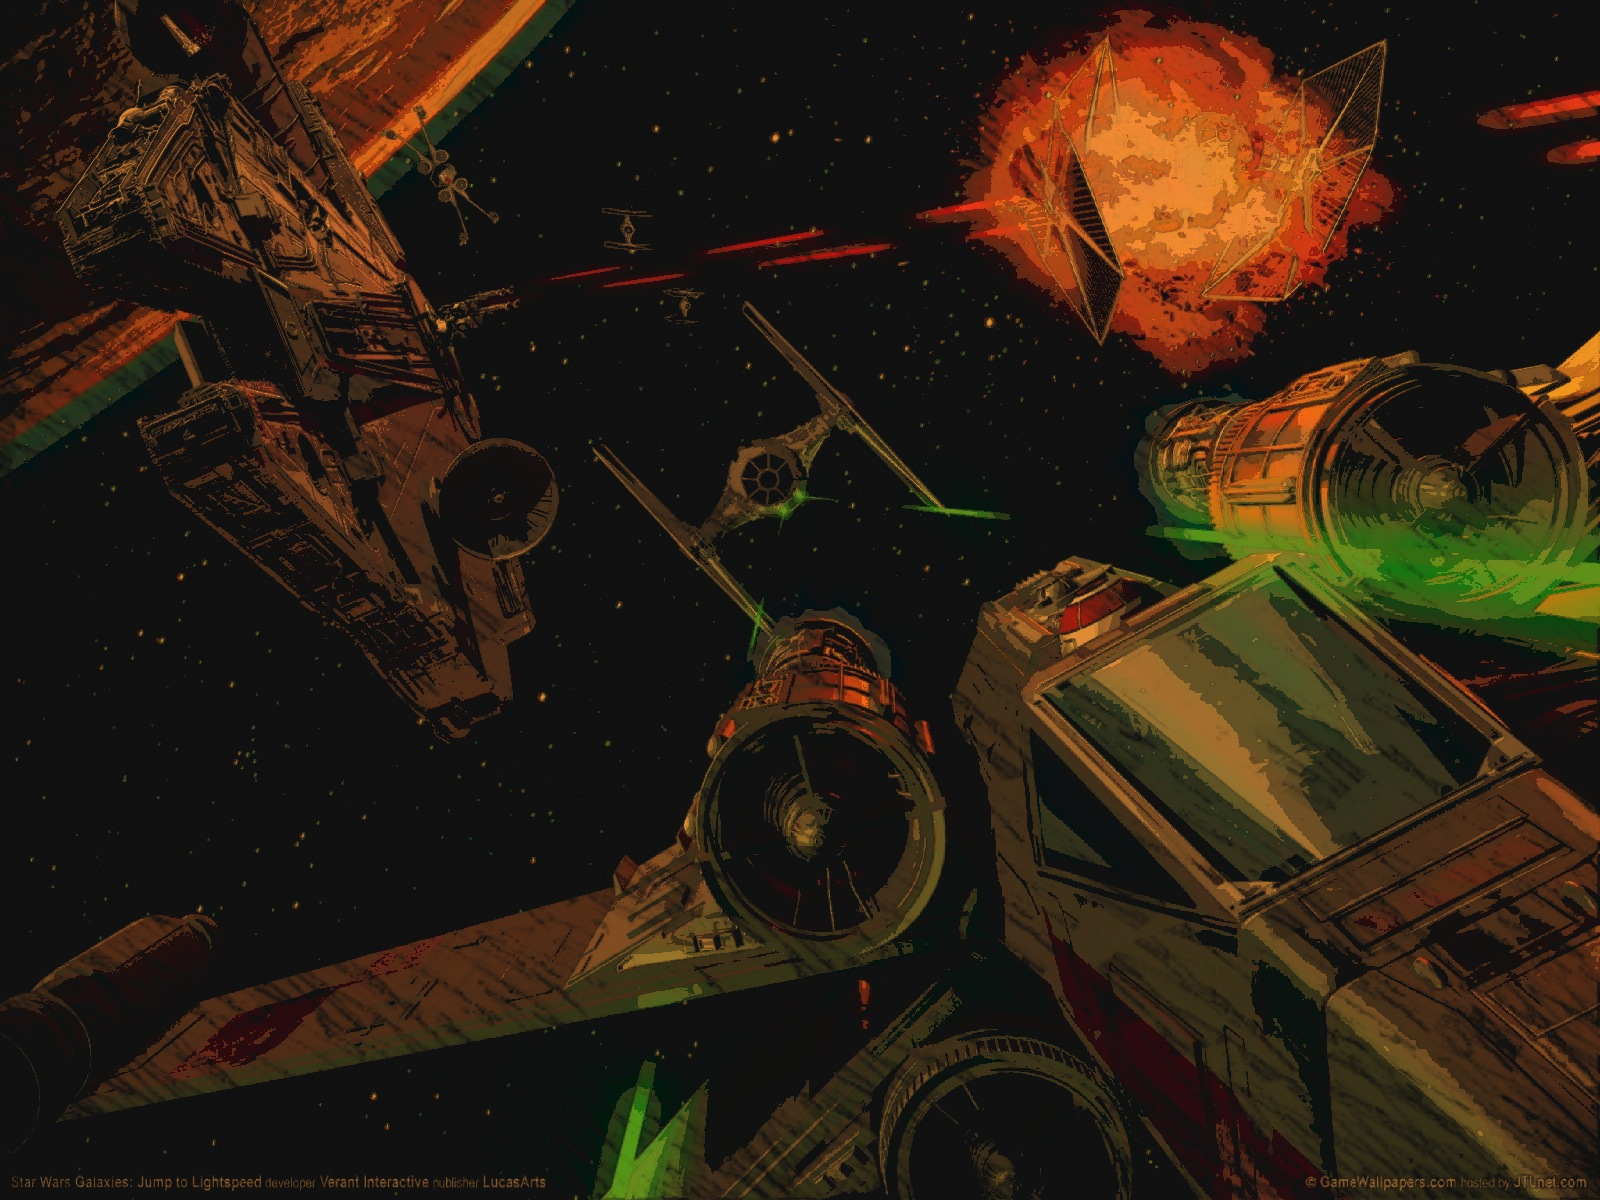 Space Battle Star Wars Galaxies 1878368 Hd Wallpaper